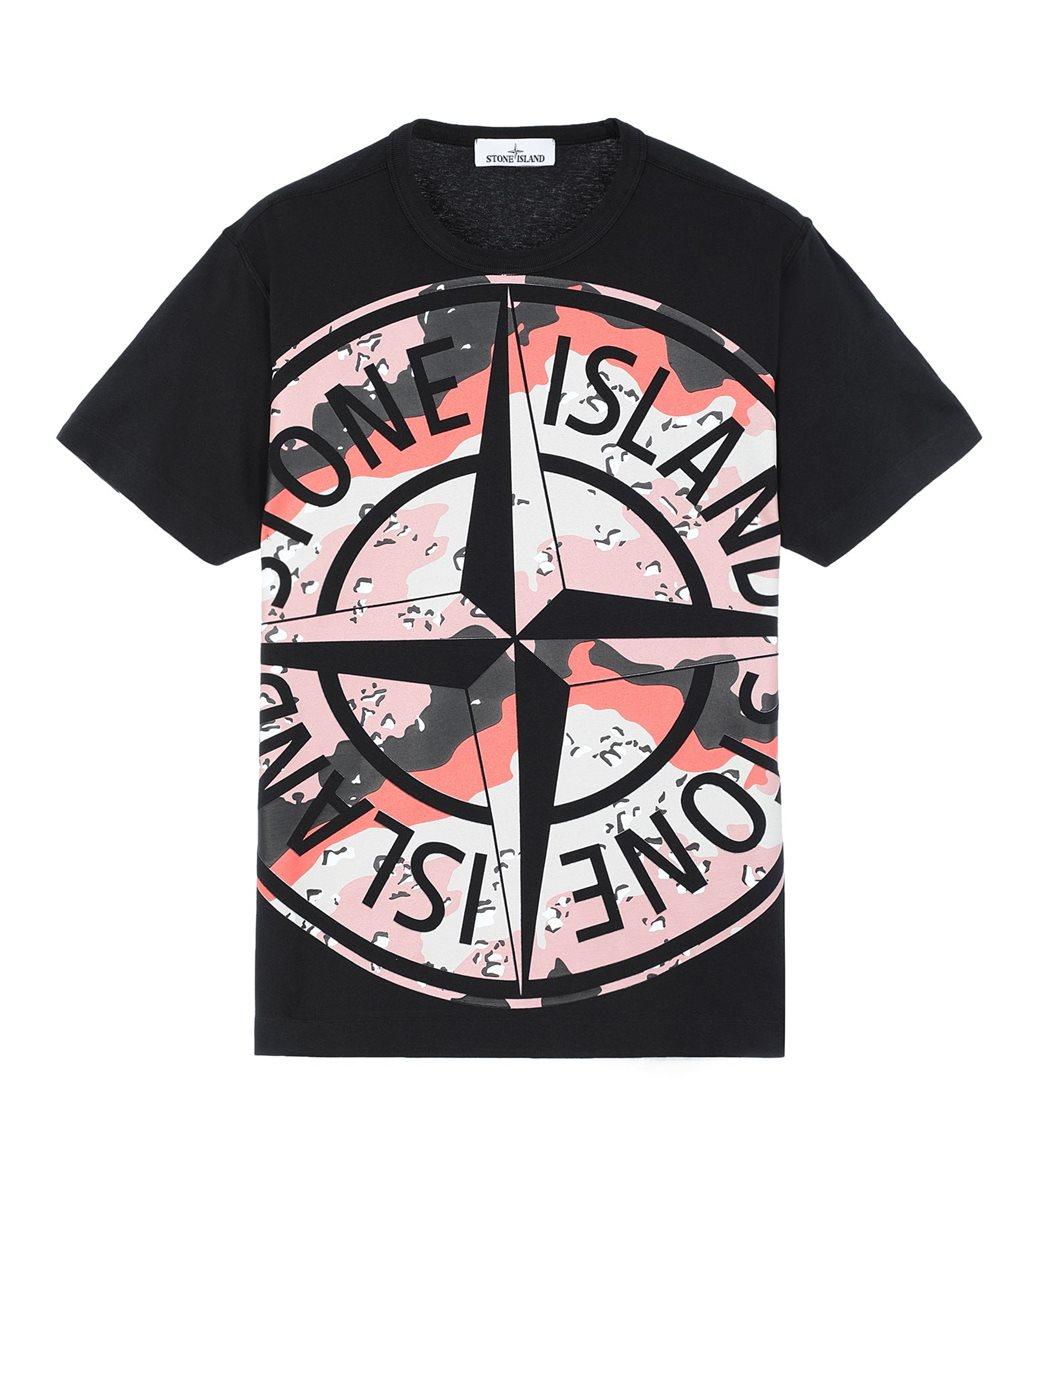 STONE ISLAND 7215 V0029 T-SHIRT